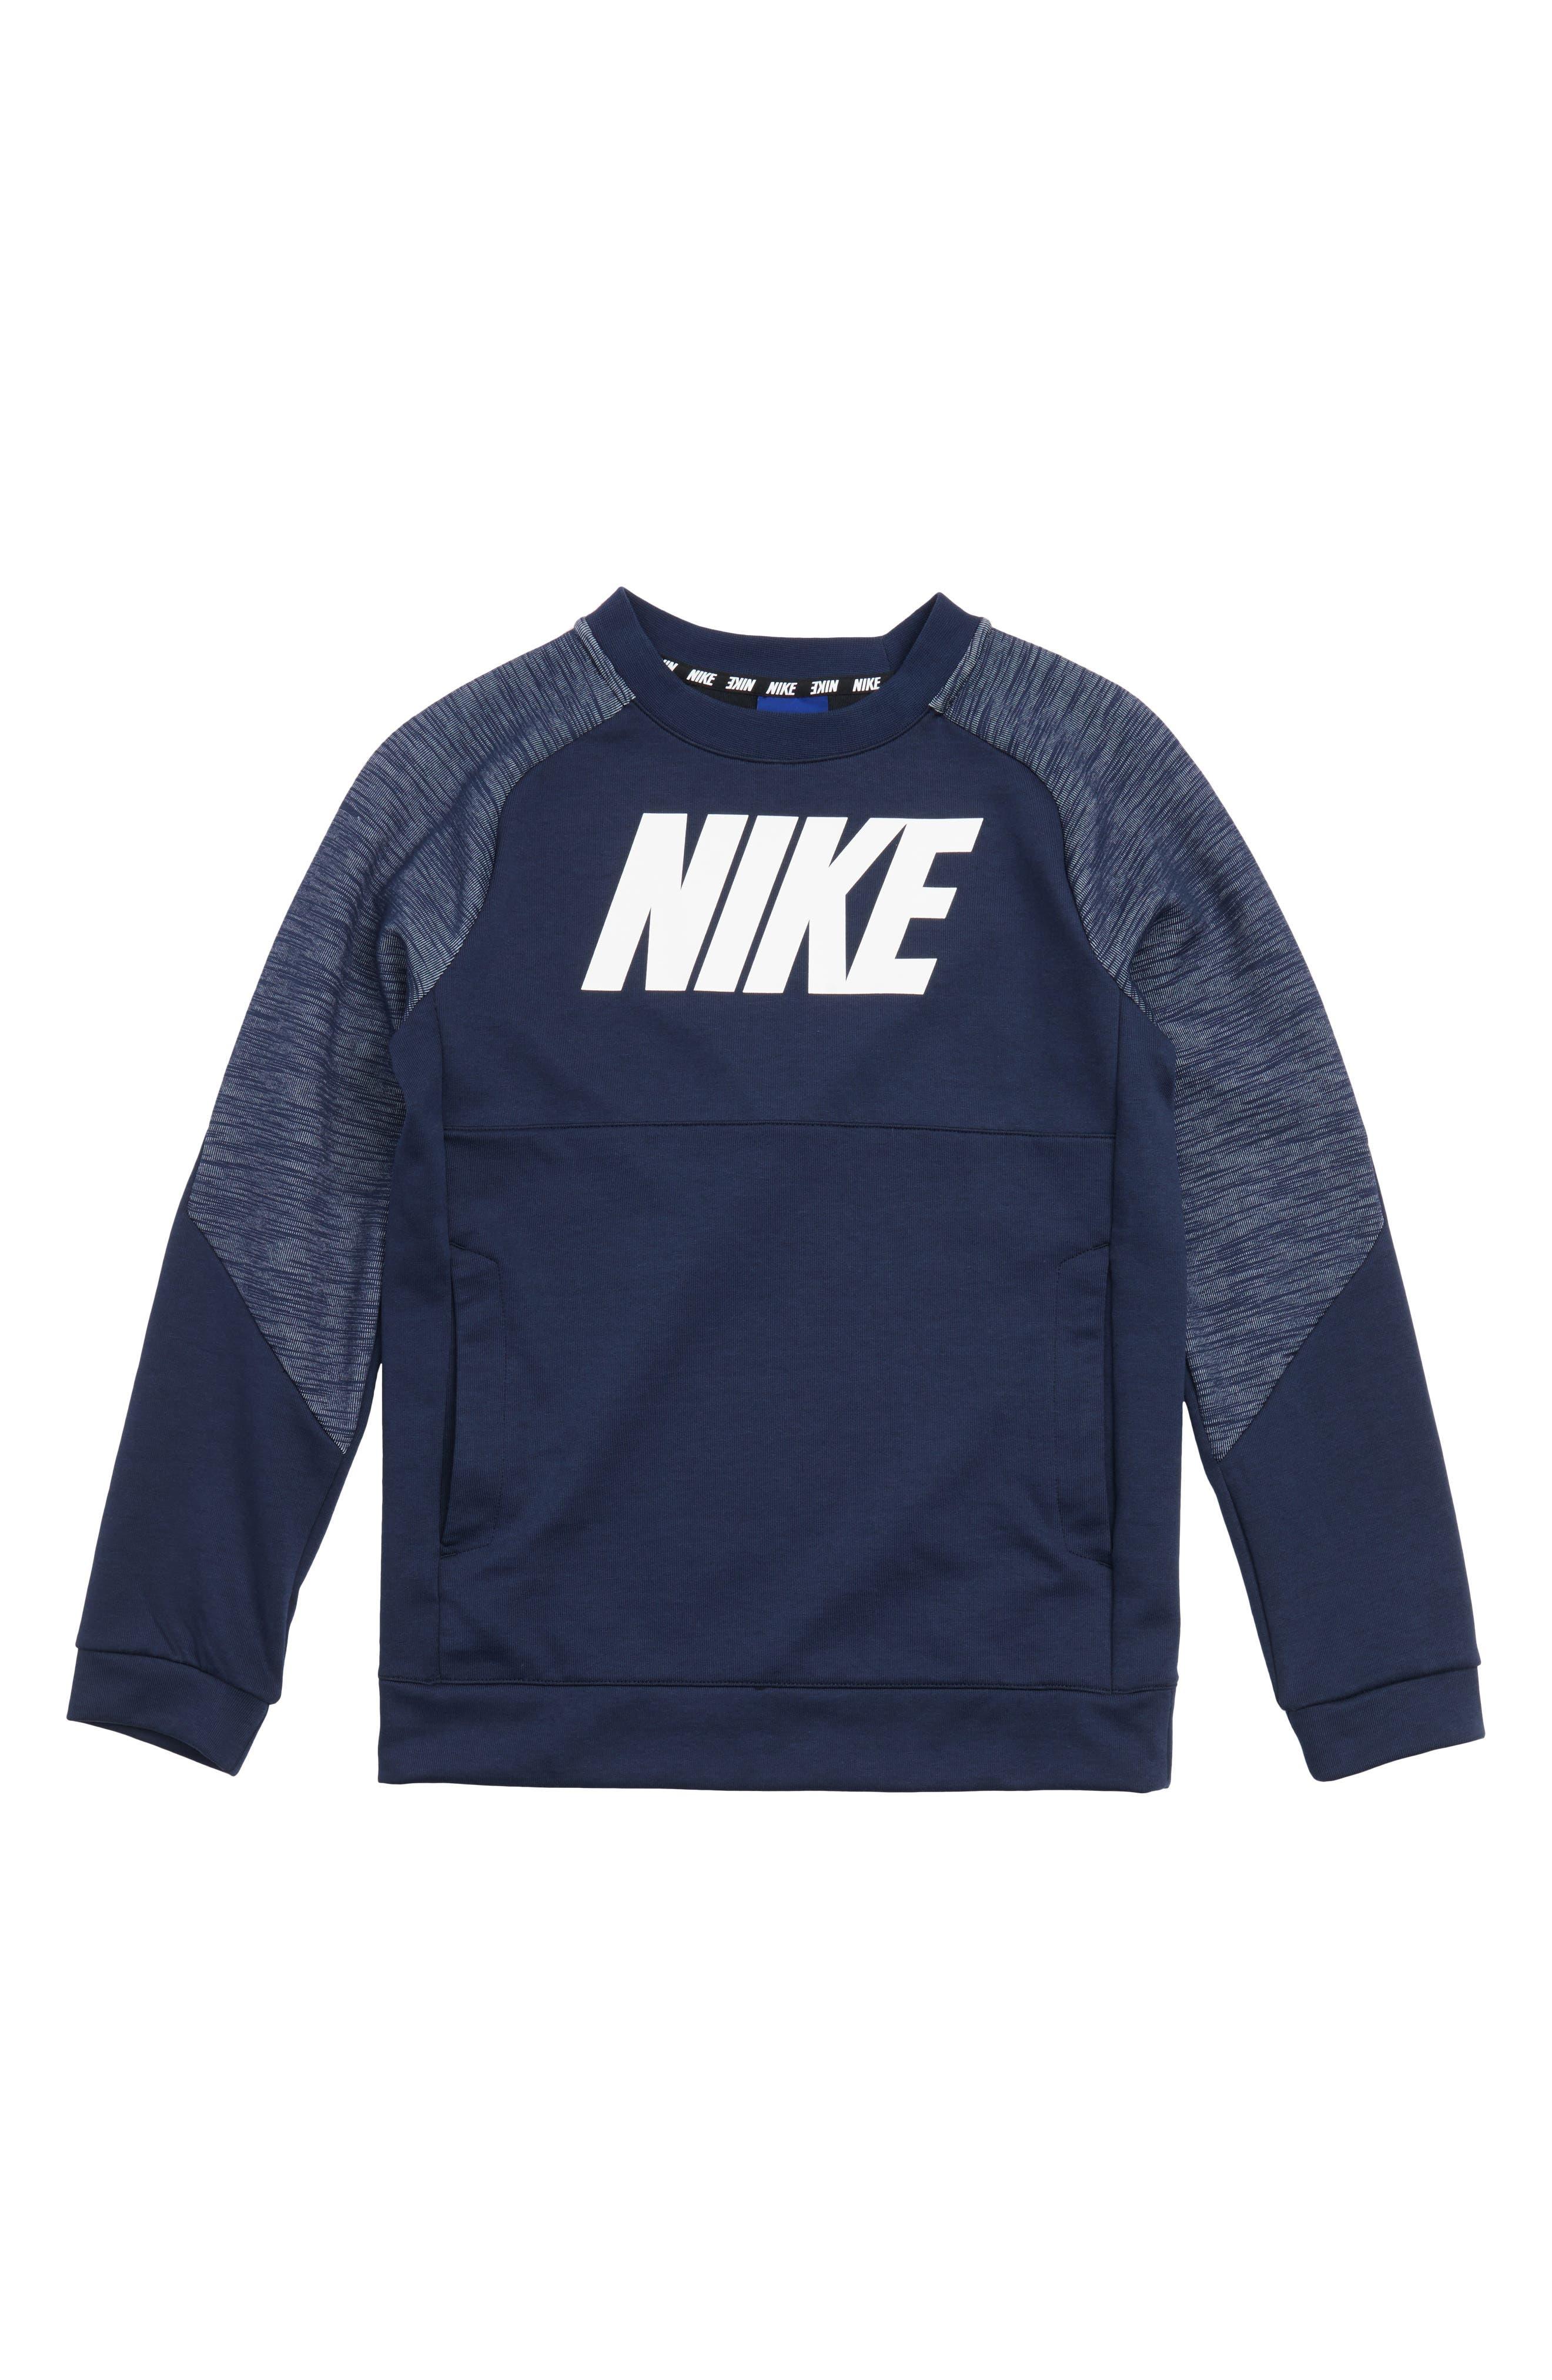 Main Image - Nike Colorblock Raglan Logo Sweatshirt (Little Boys & Big Boys)